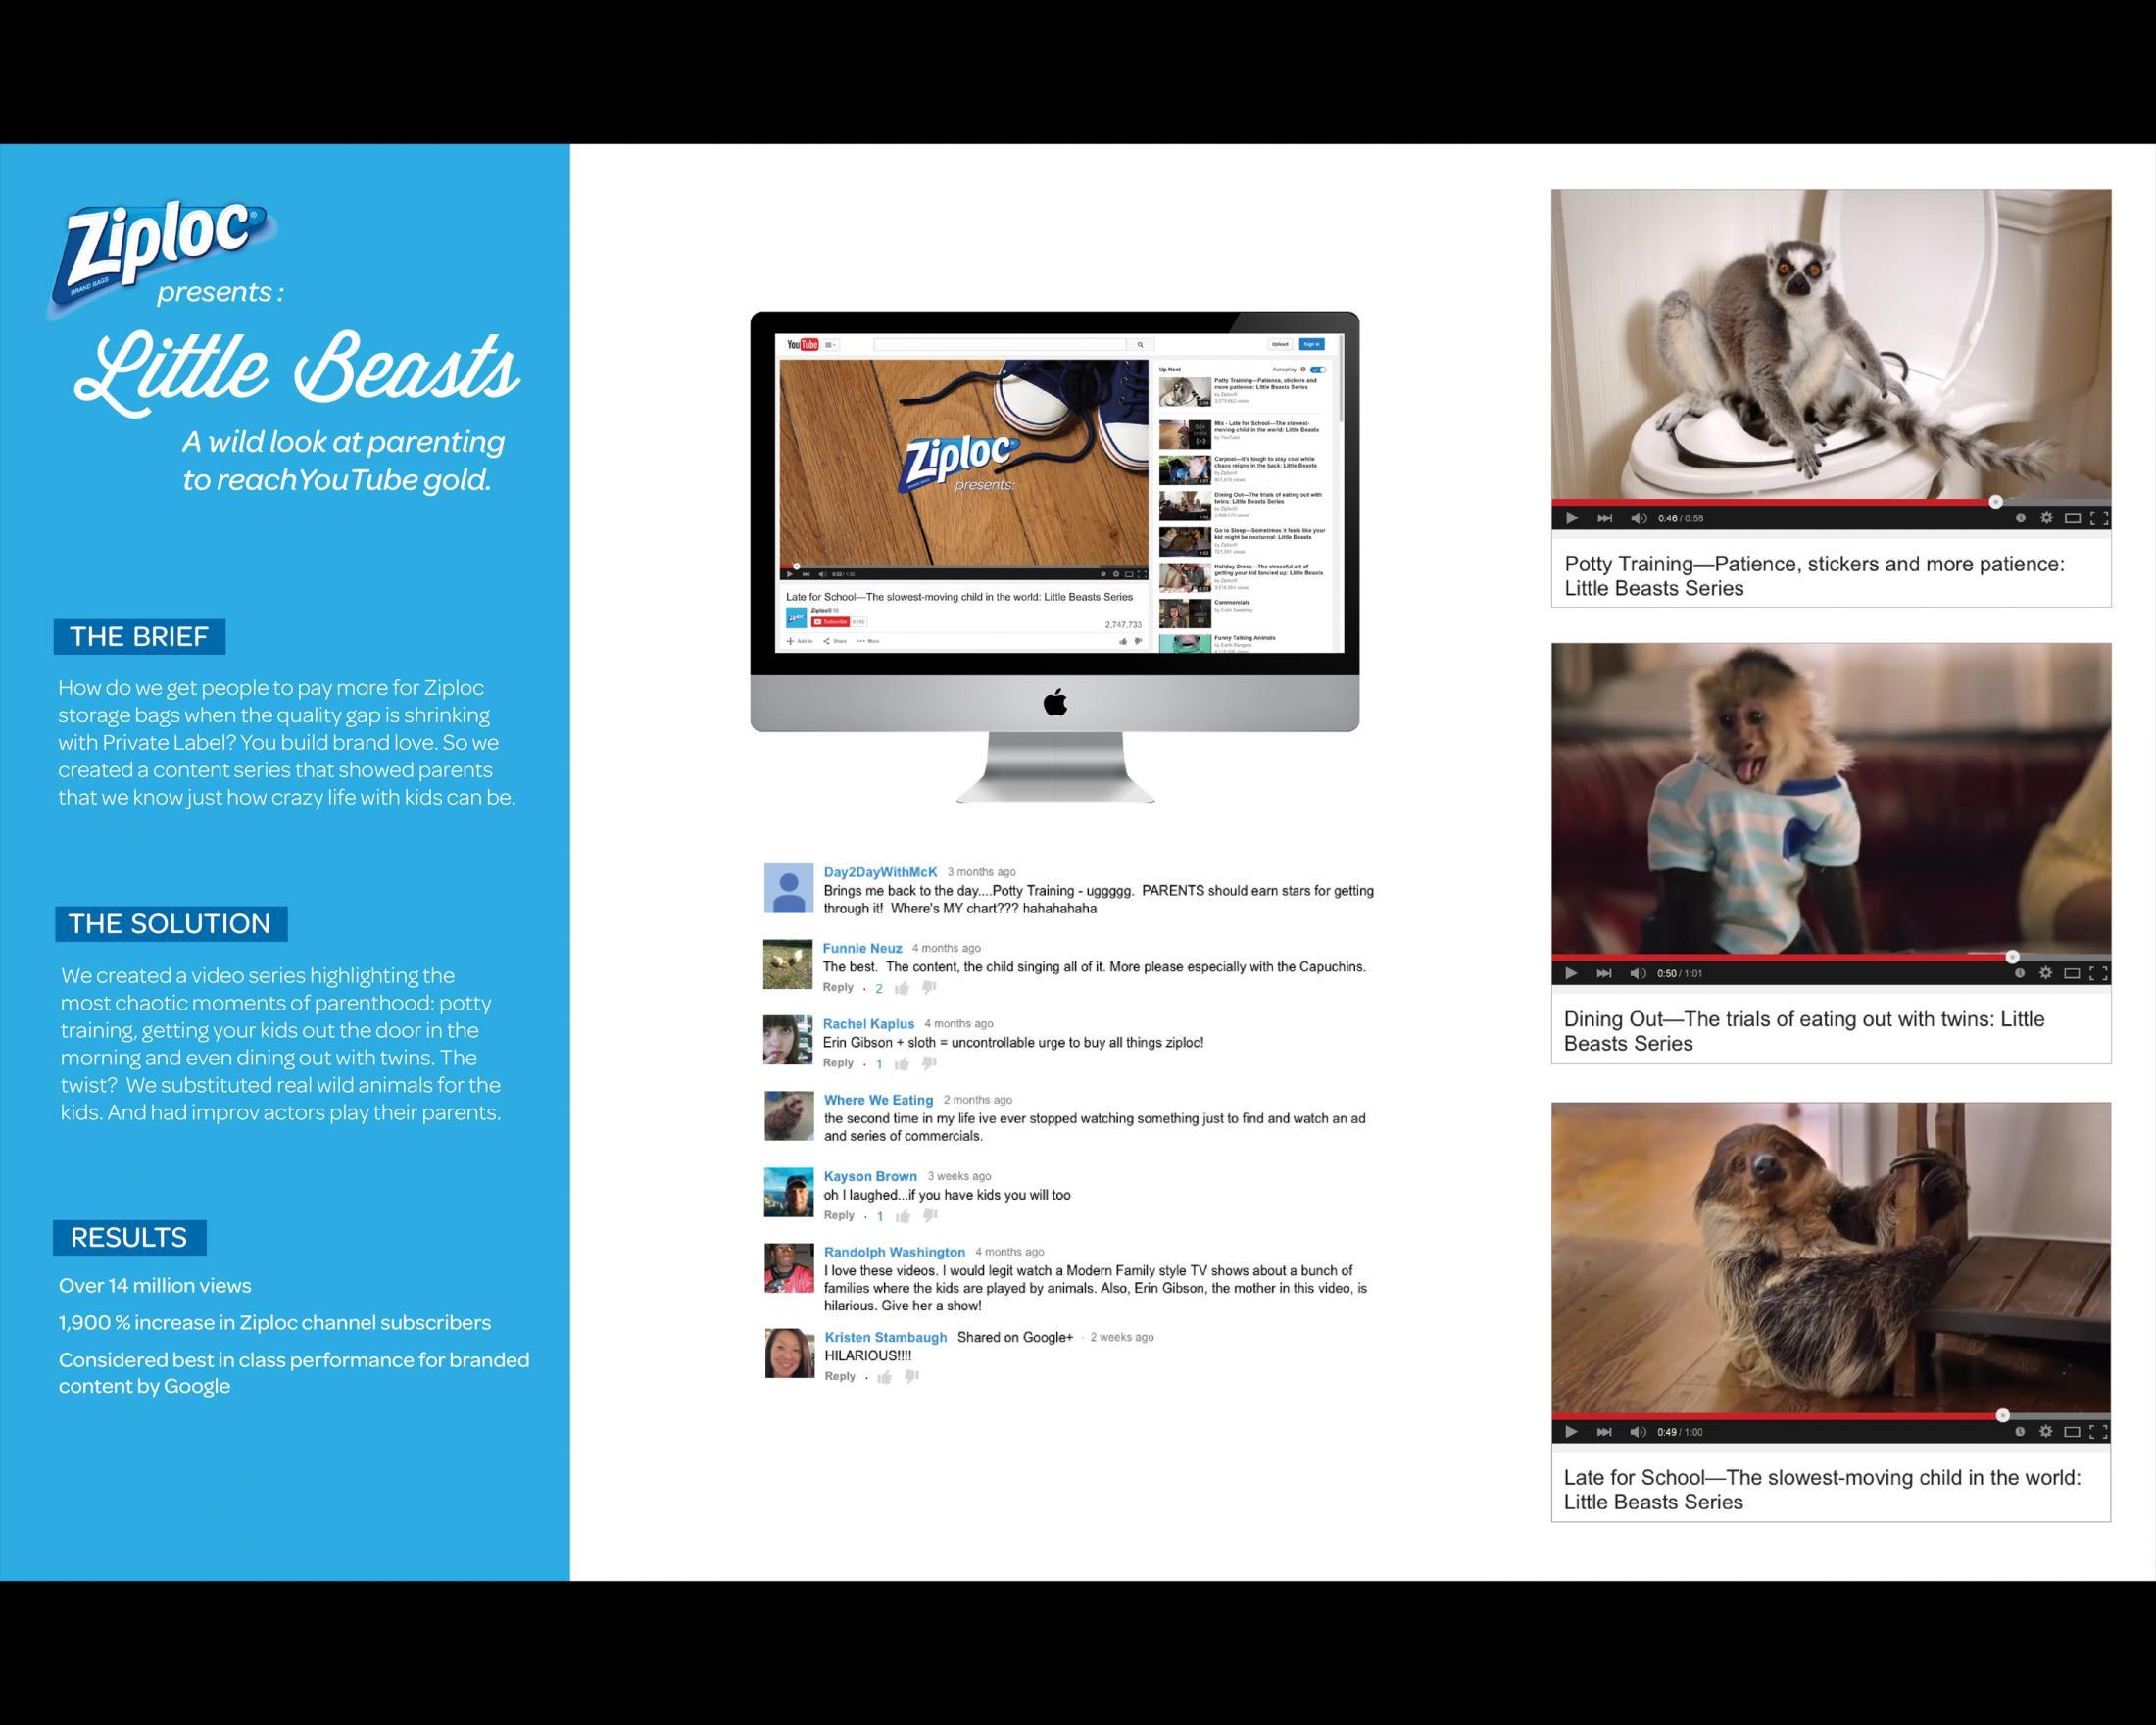 Thumbnail for Ziploc Presents: Little Beasts